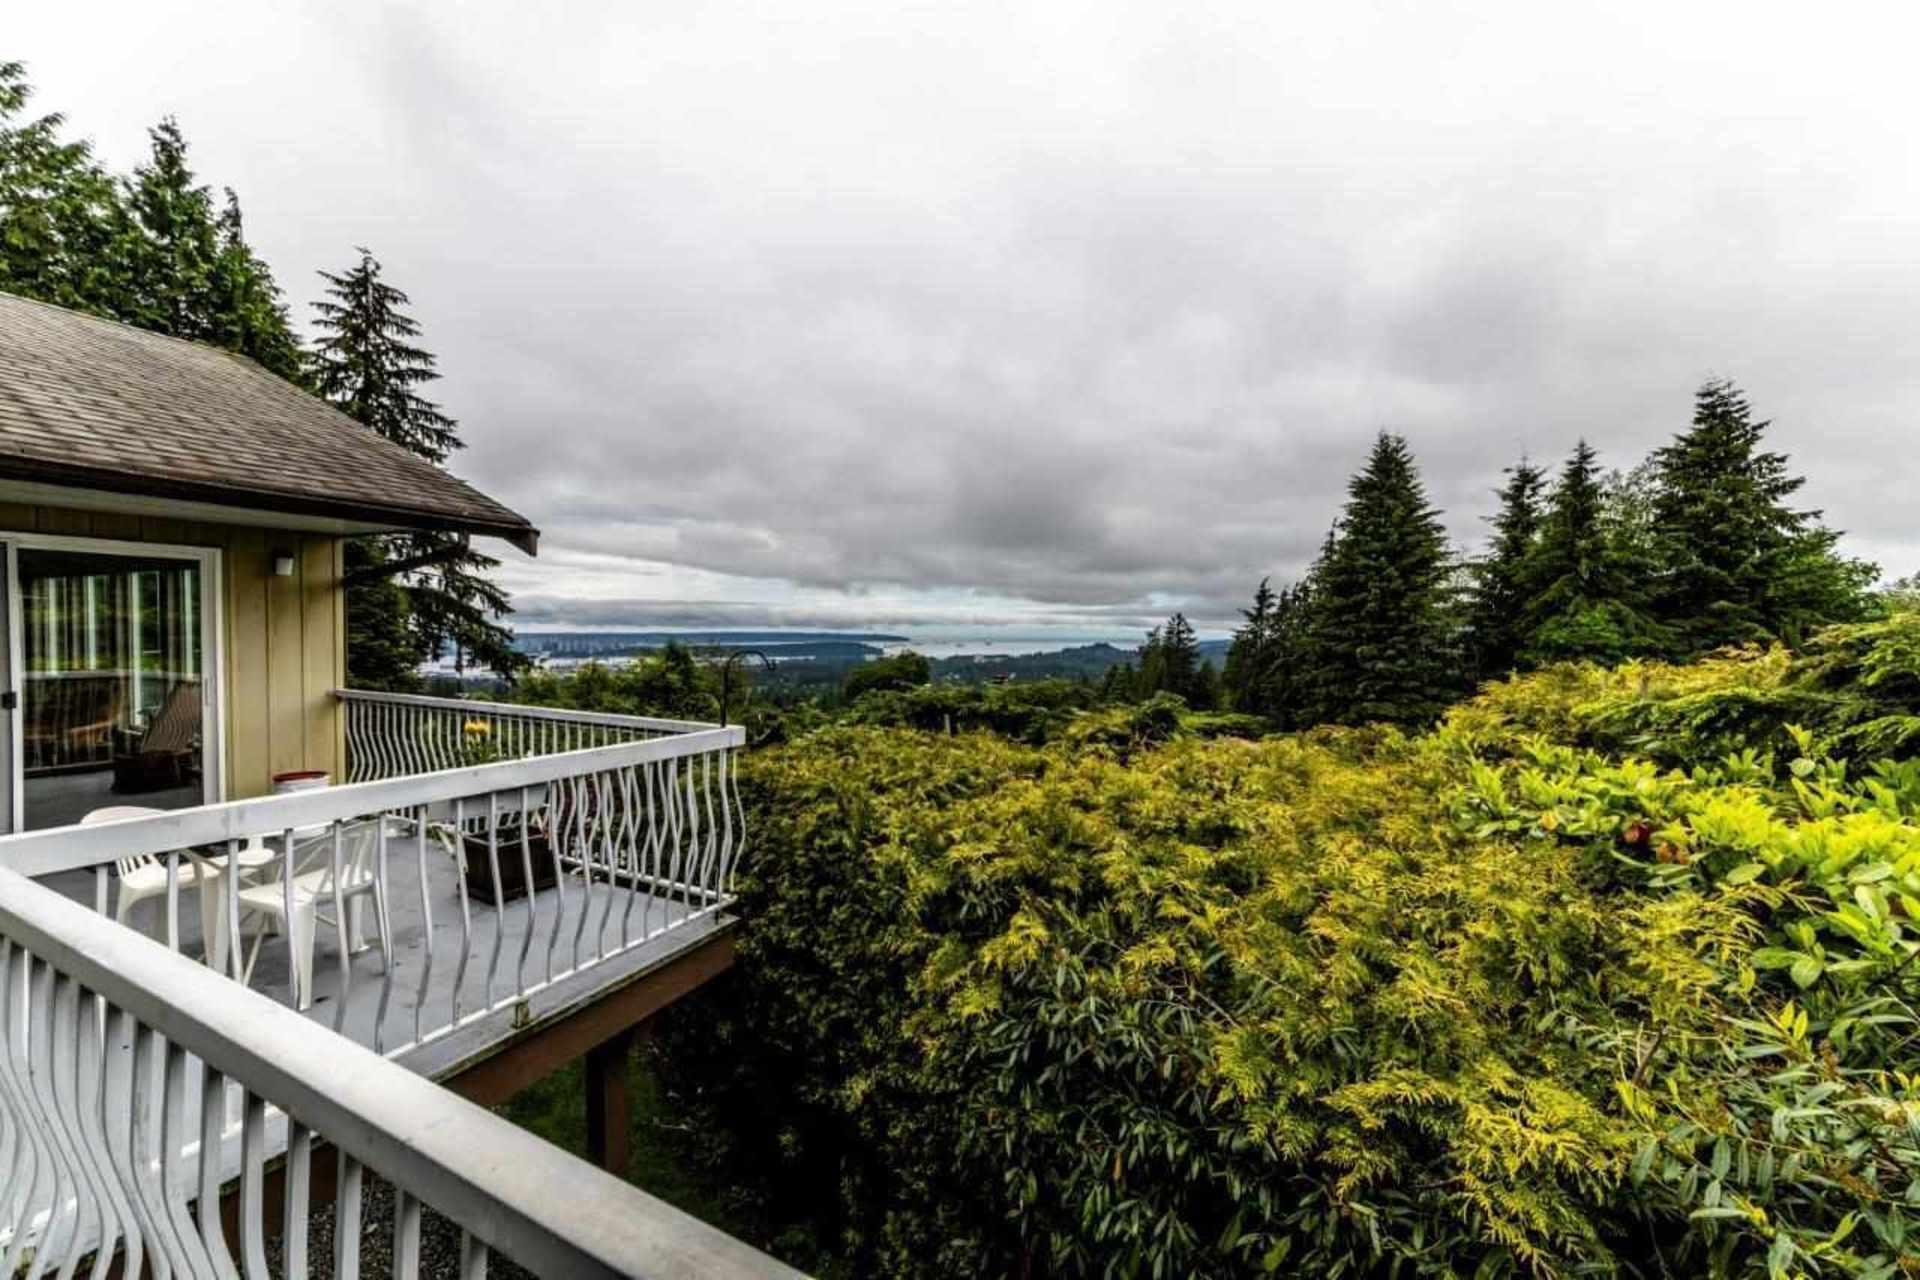 3863-st-pauls-avenue-upper-lonsdale-north-vancouver-19 at 3863 St. Pauls Avenue, Upper Lonsdale, North Vancouver